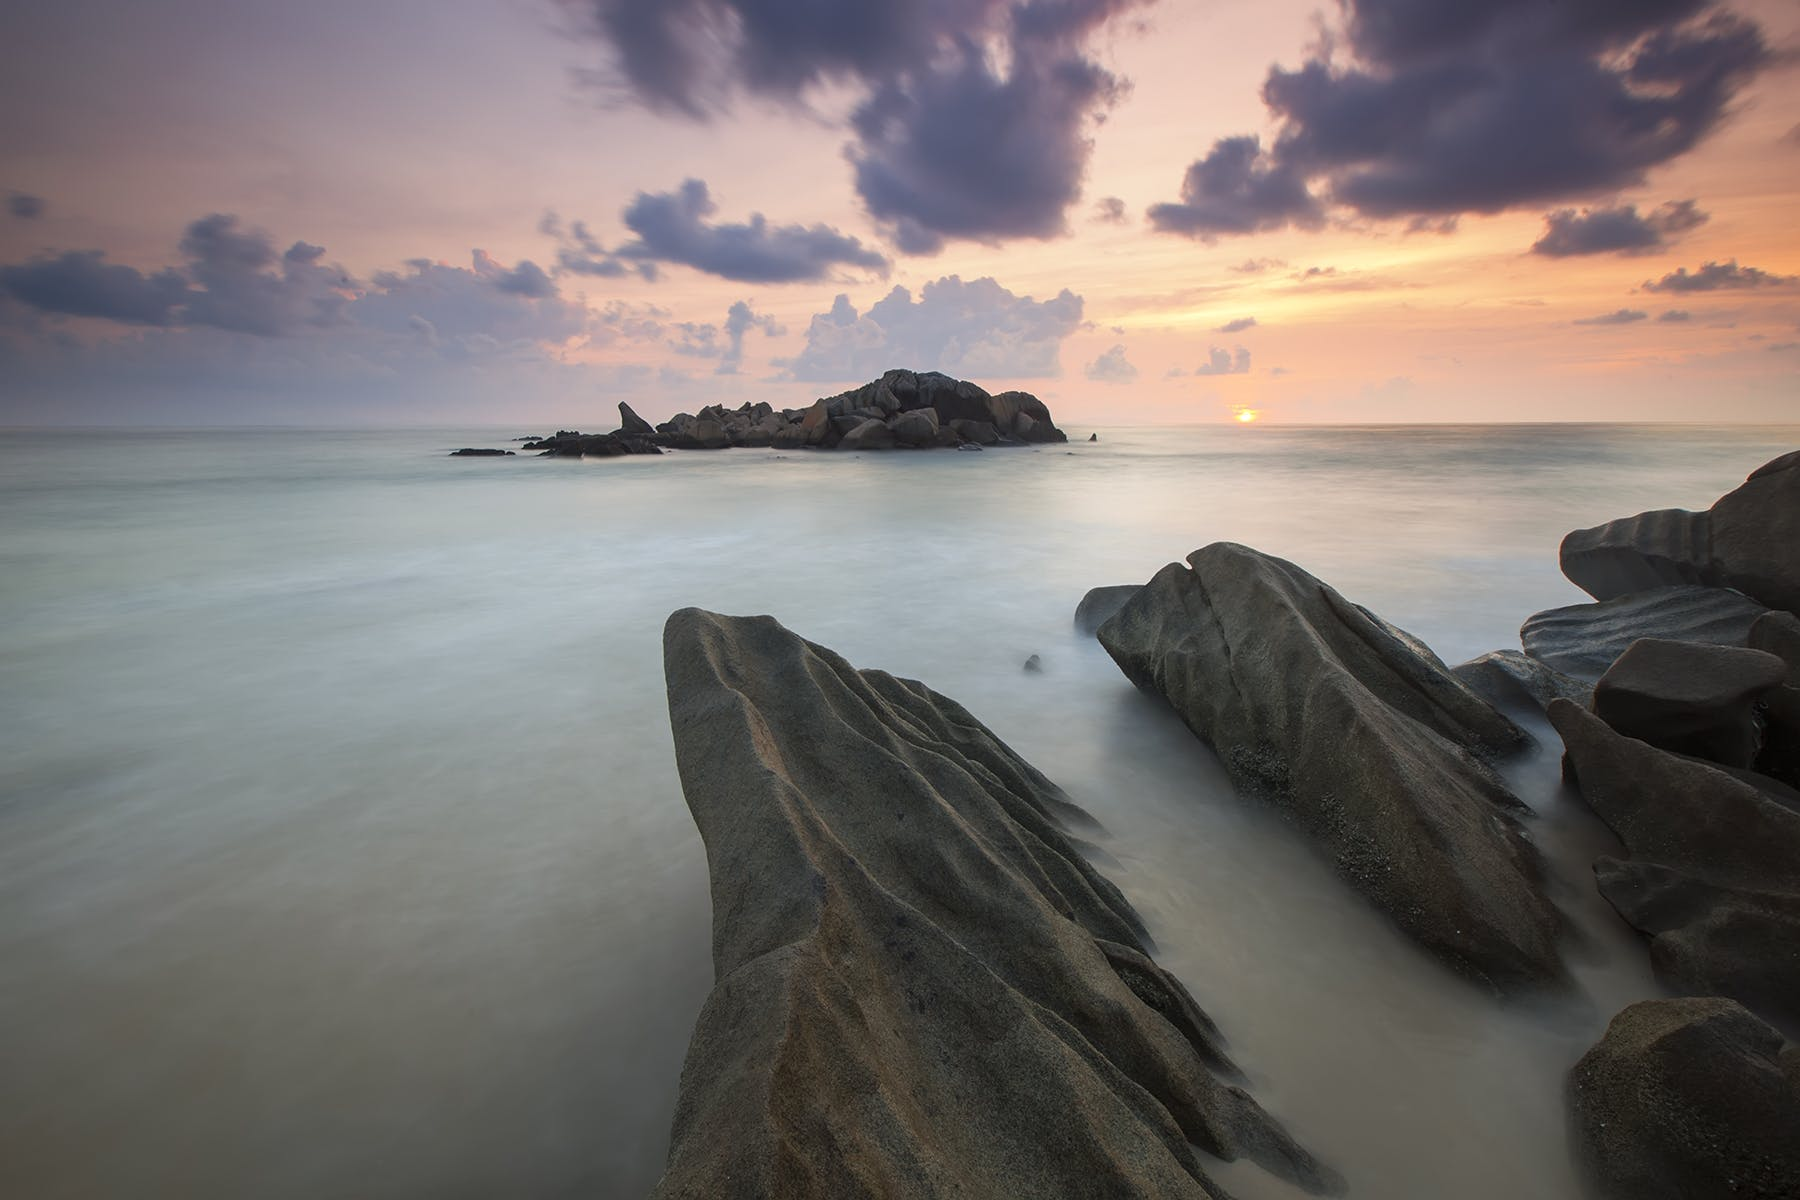 Rock Near a White Foggy Area Under an Orange Sky